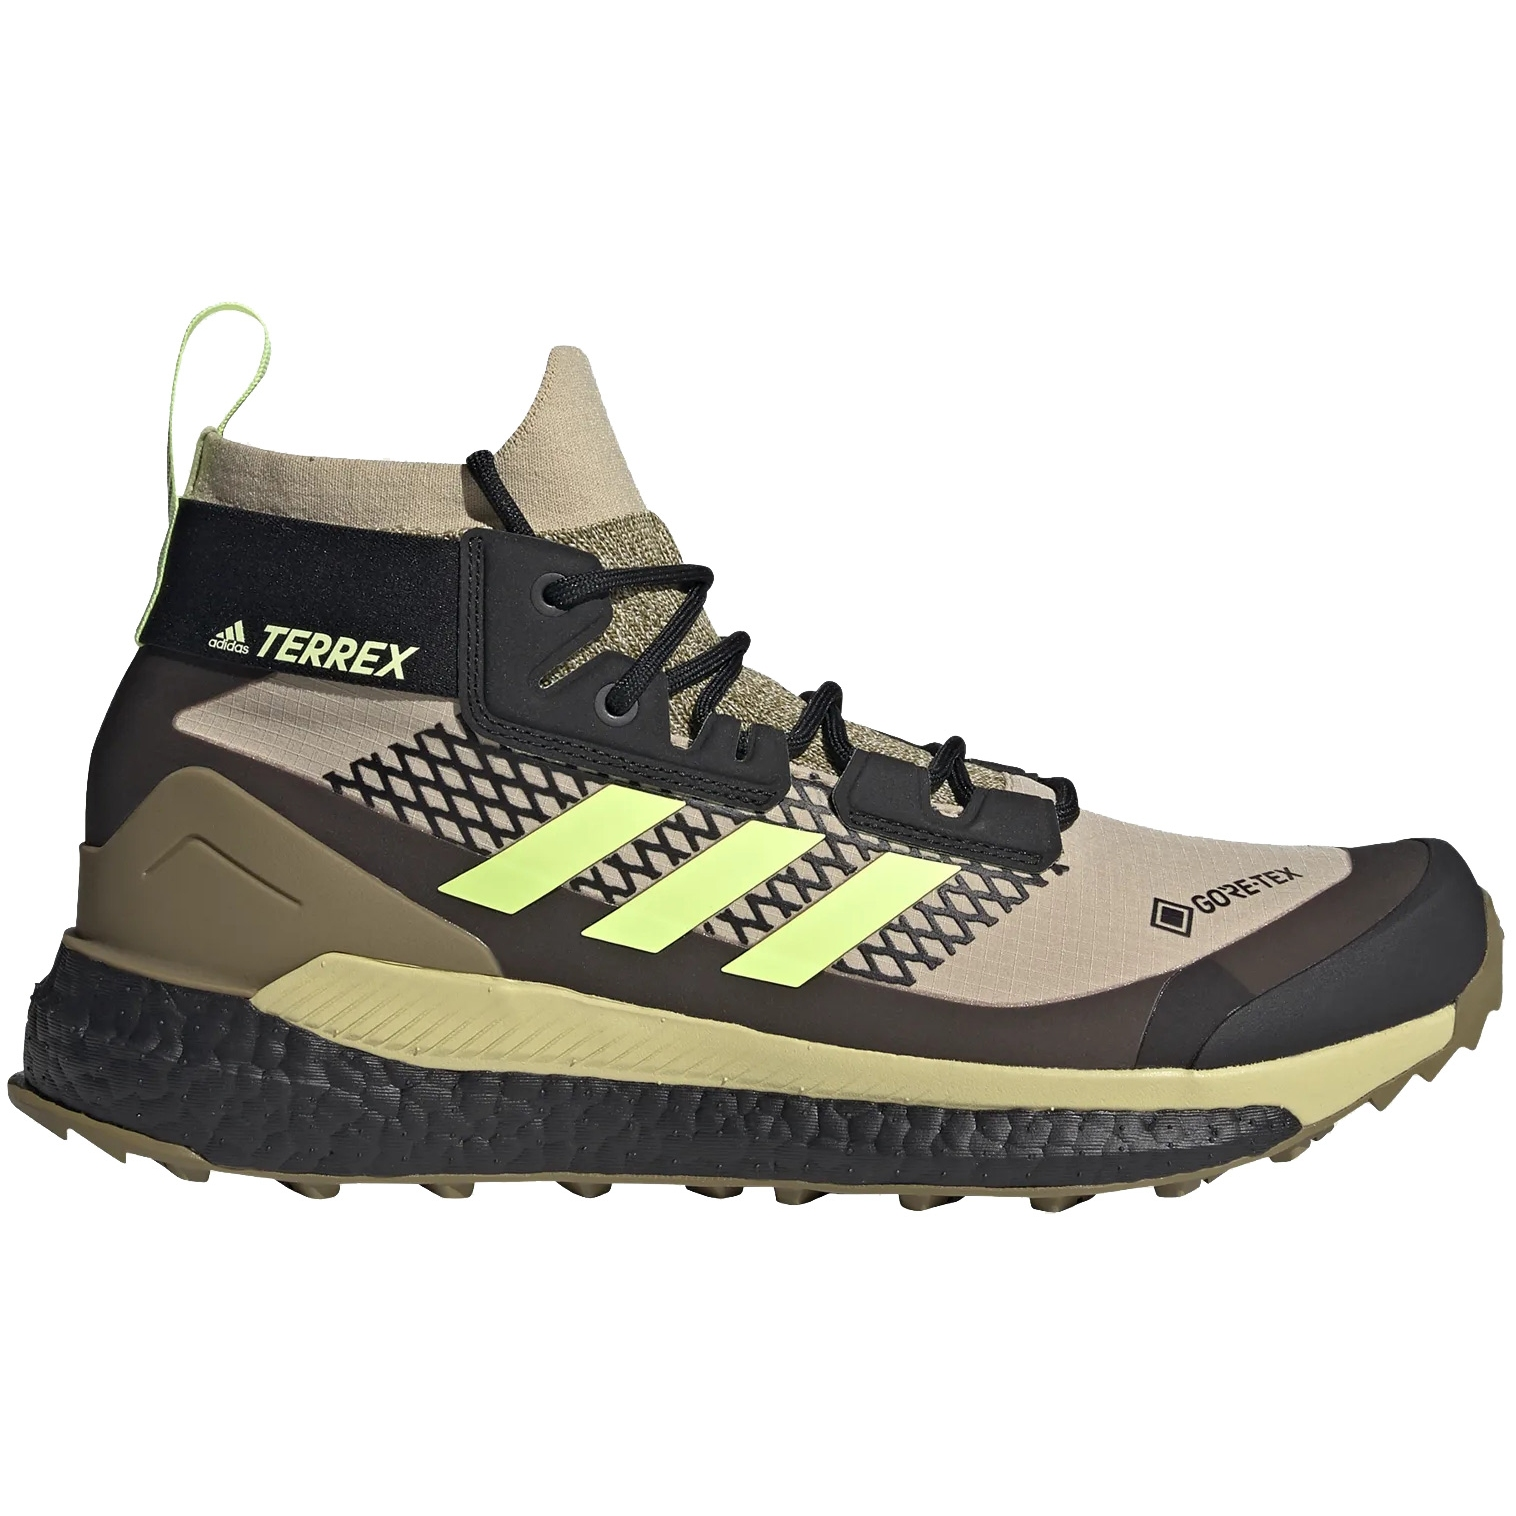 adidas Männer TERREX Free Hiker GORE-TEX Wanderschuhe - savanna/hi-res yellow/core black FX4509